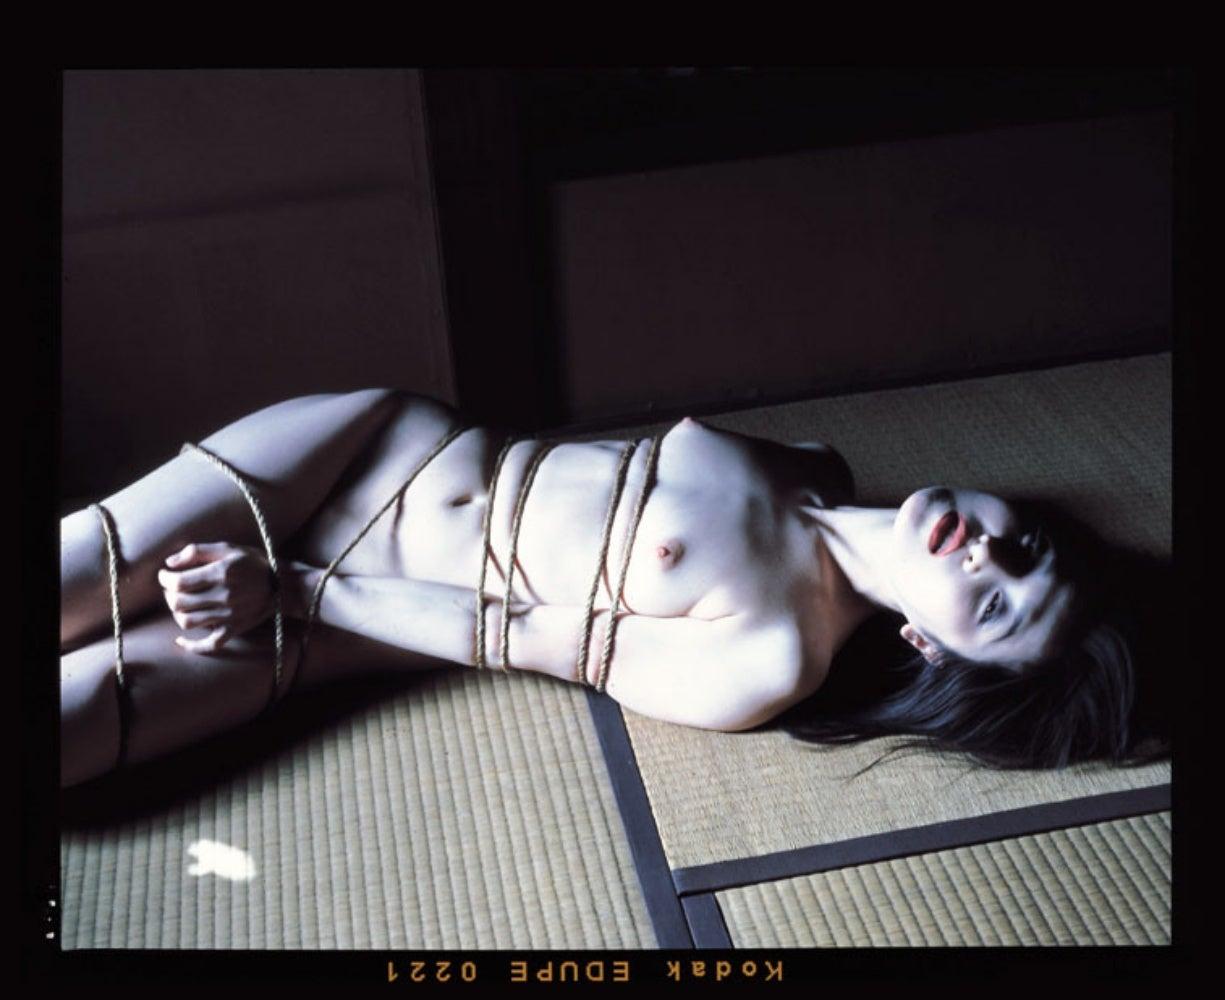 67 Shooting Back #GDN051 – Nobuyoshi Araki, Woman, Bondage, Japan, Photography